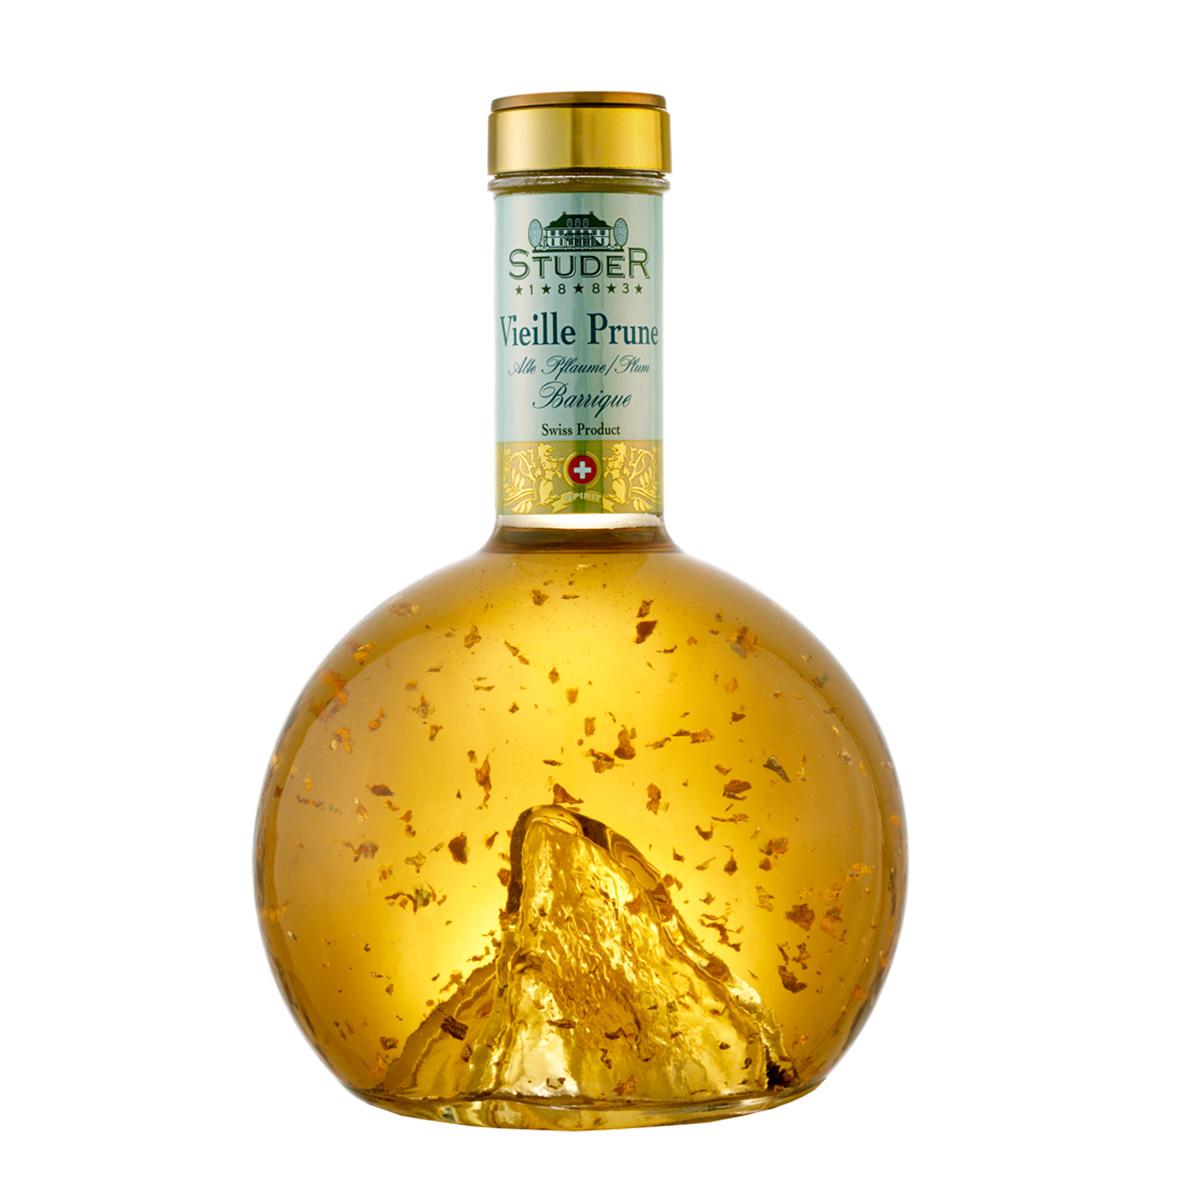 Vieille Prune Barrique mit Gold, Matterhorn, Studer